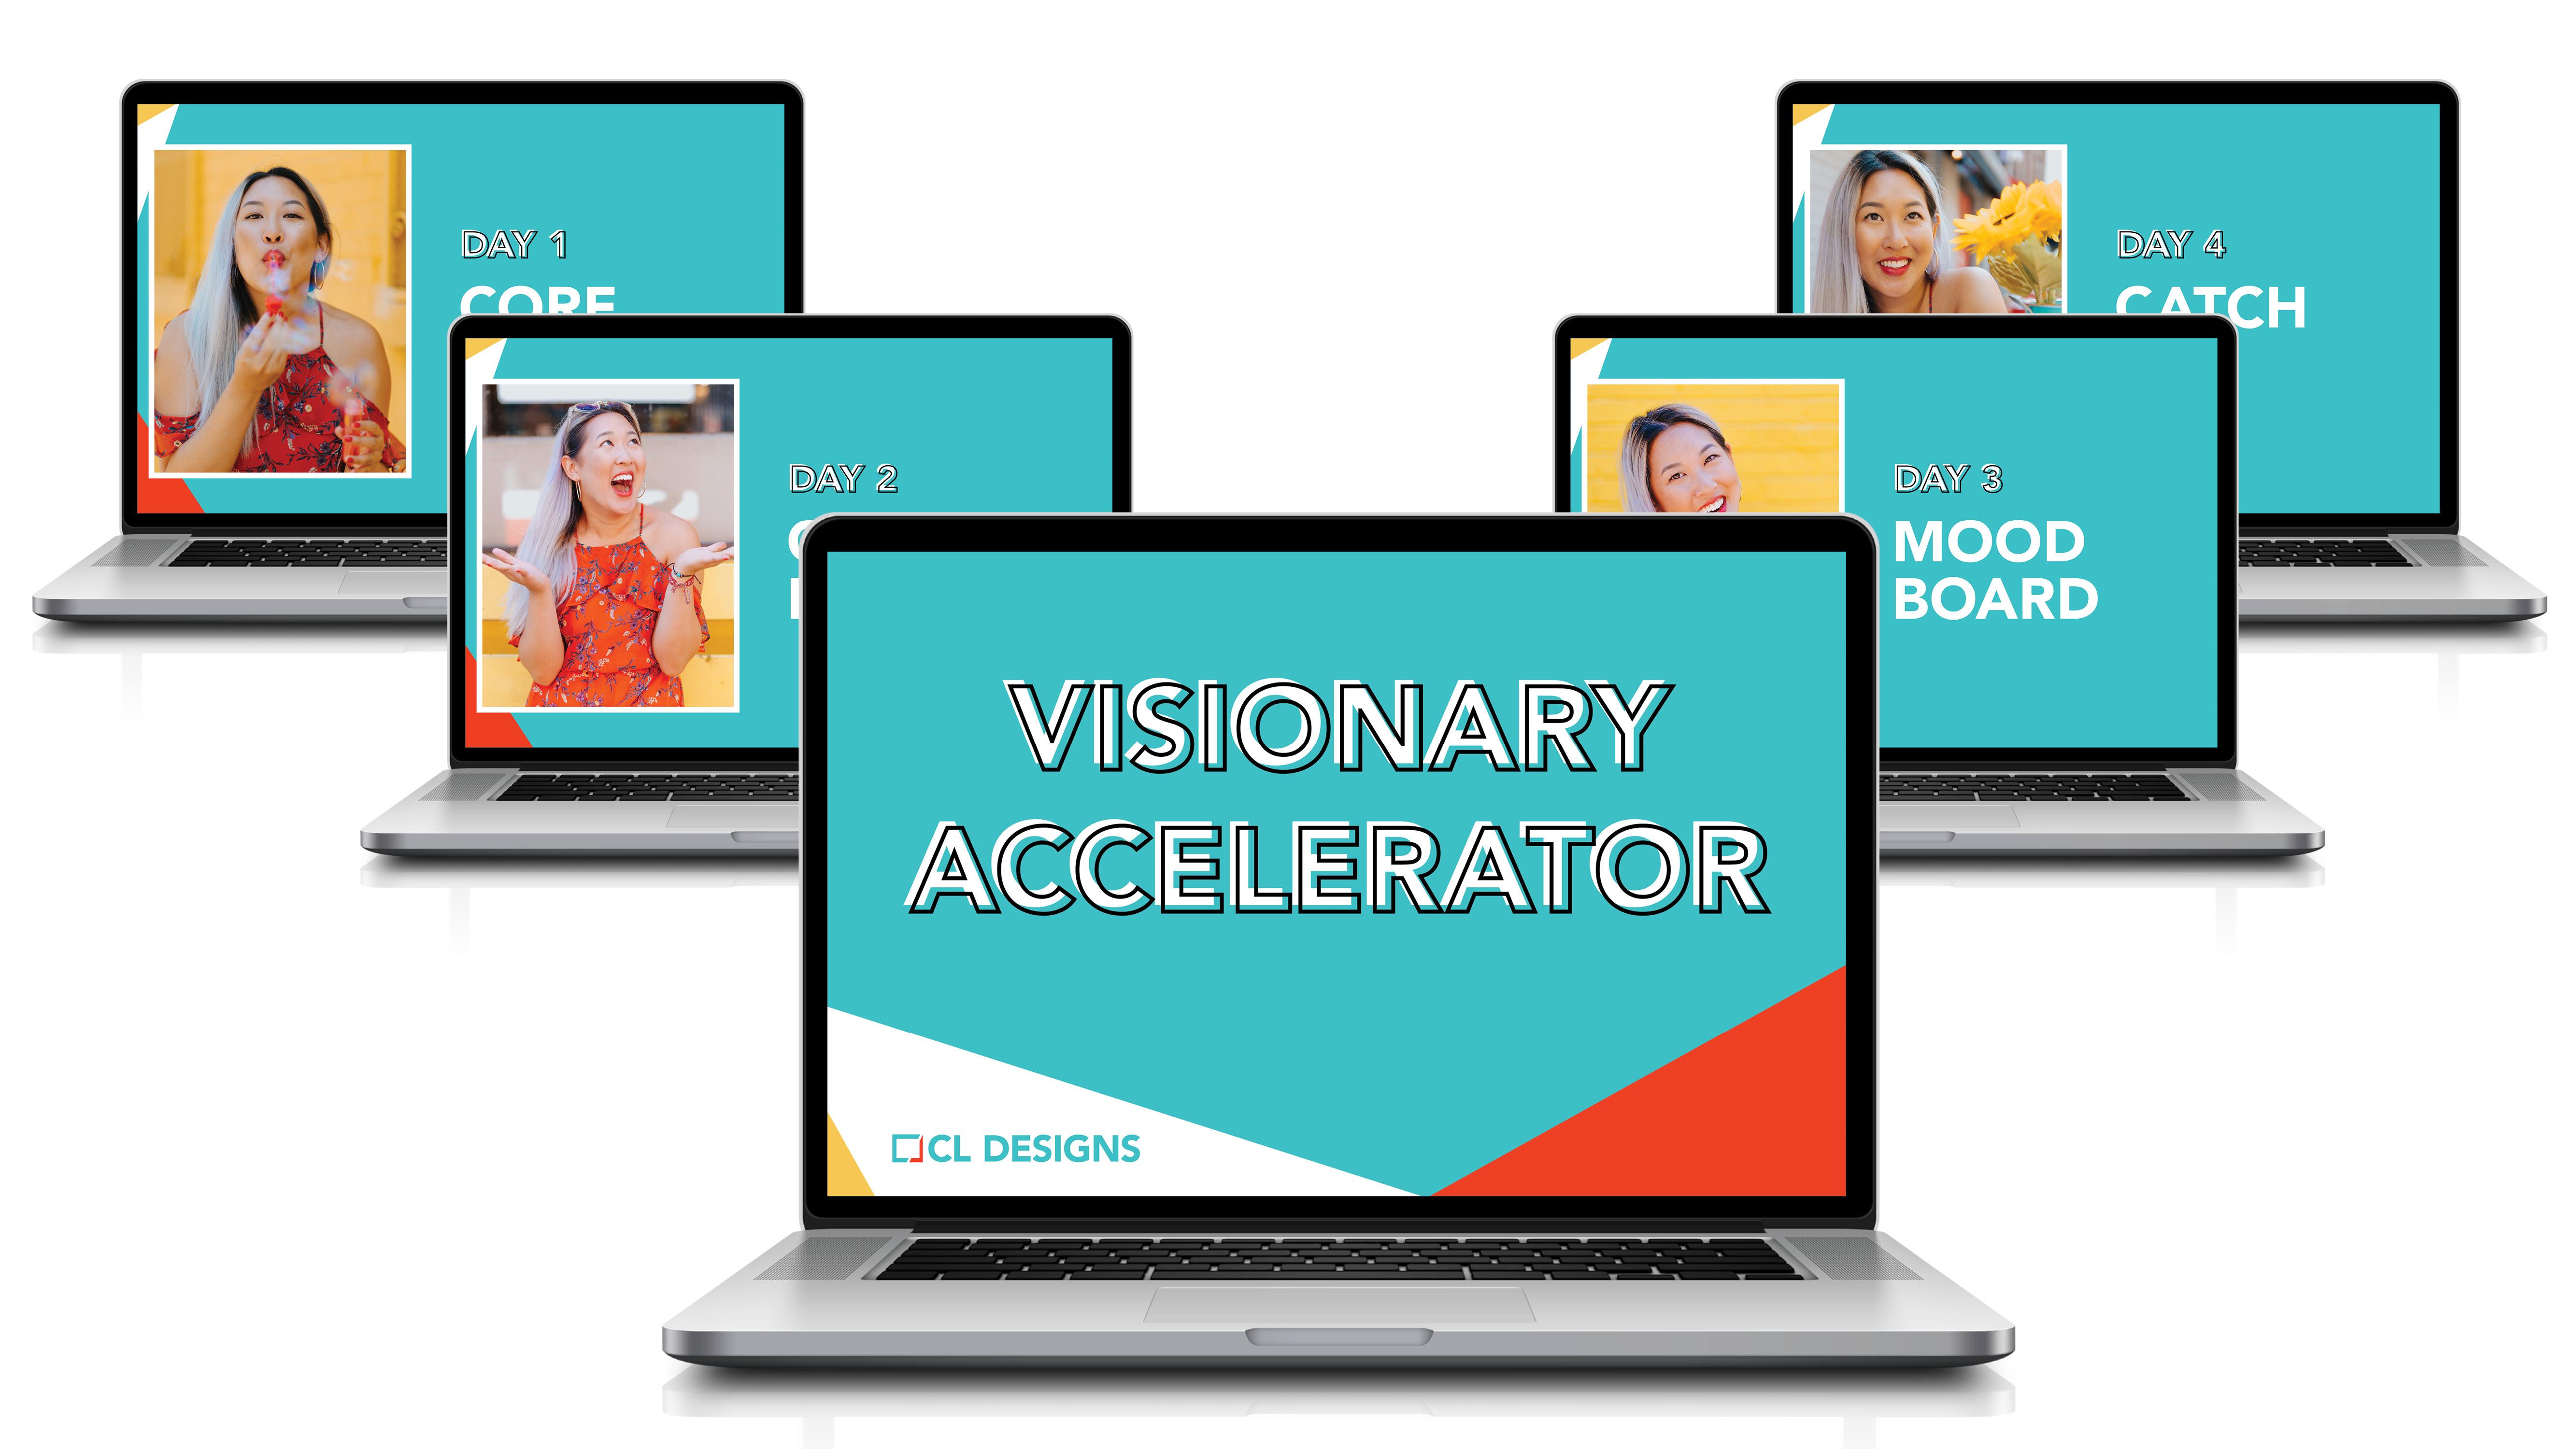 Brand Accelerator Courses